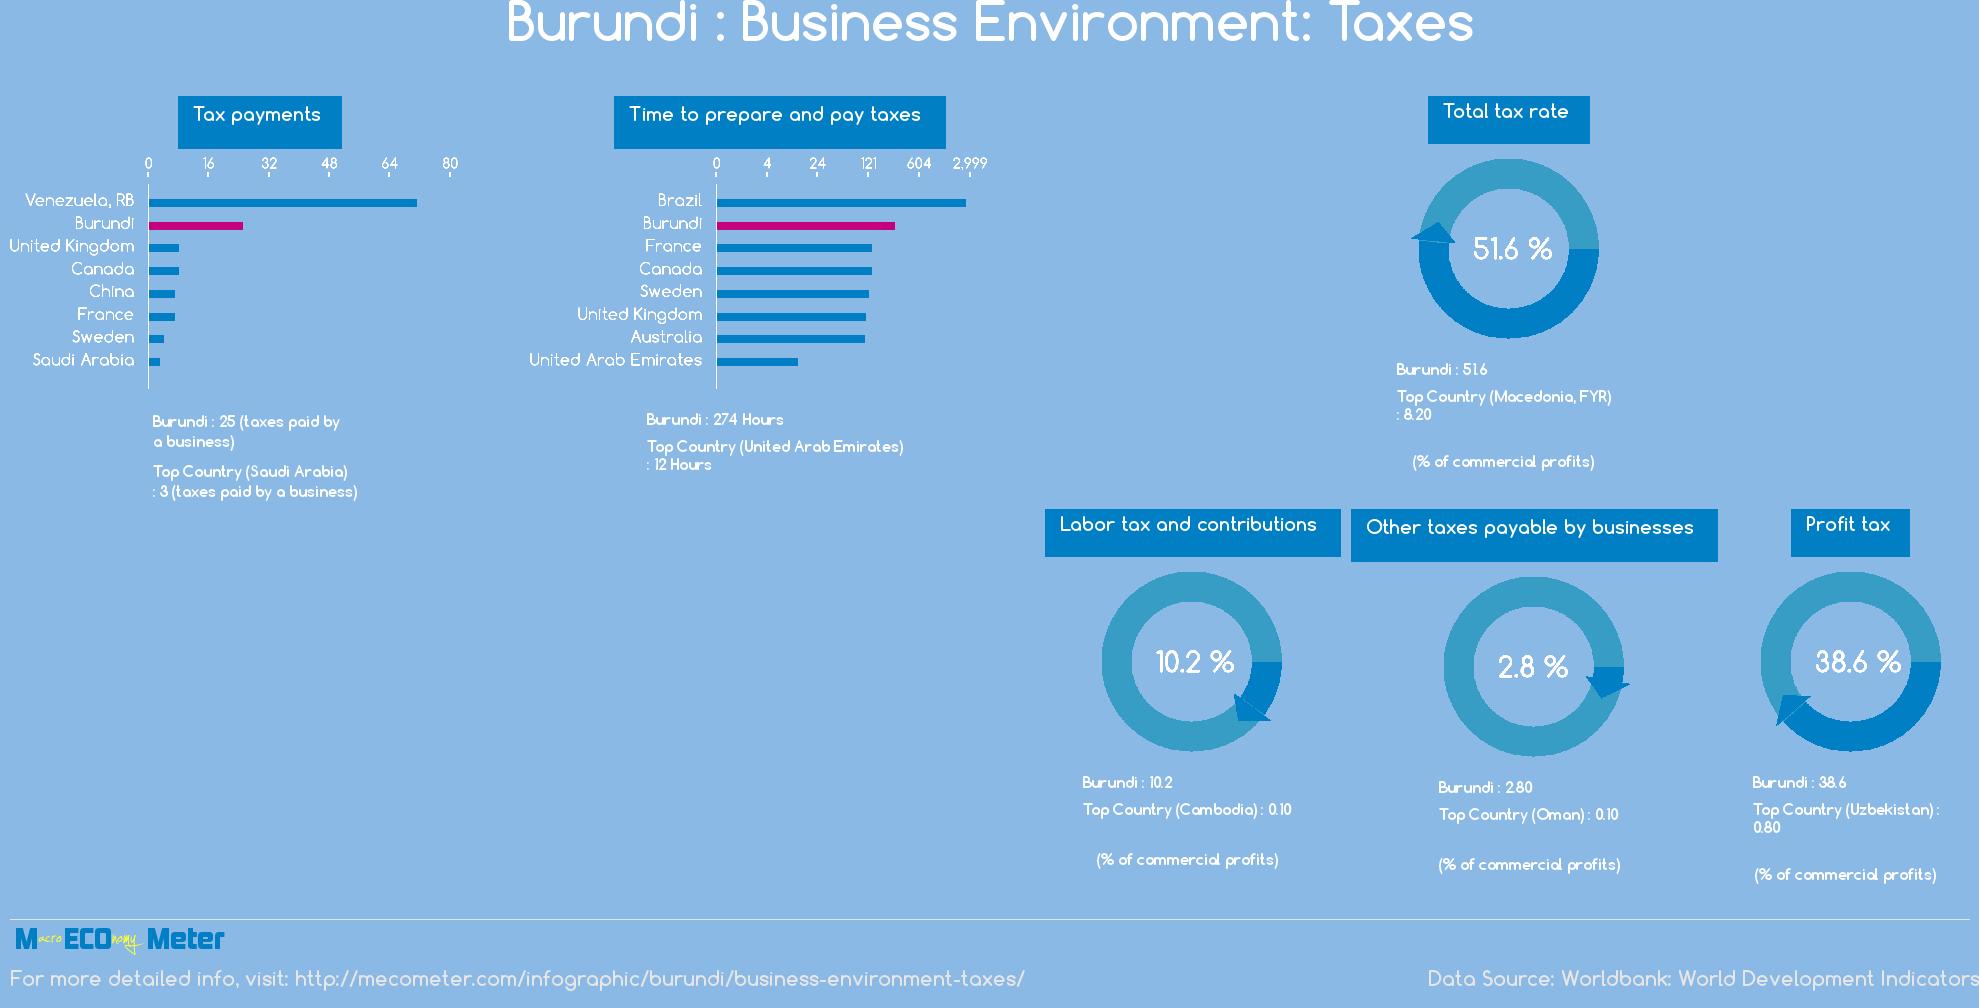 Burundi : Business Environment: Taxes